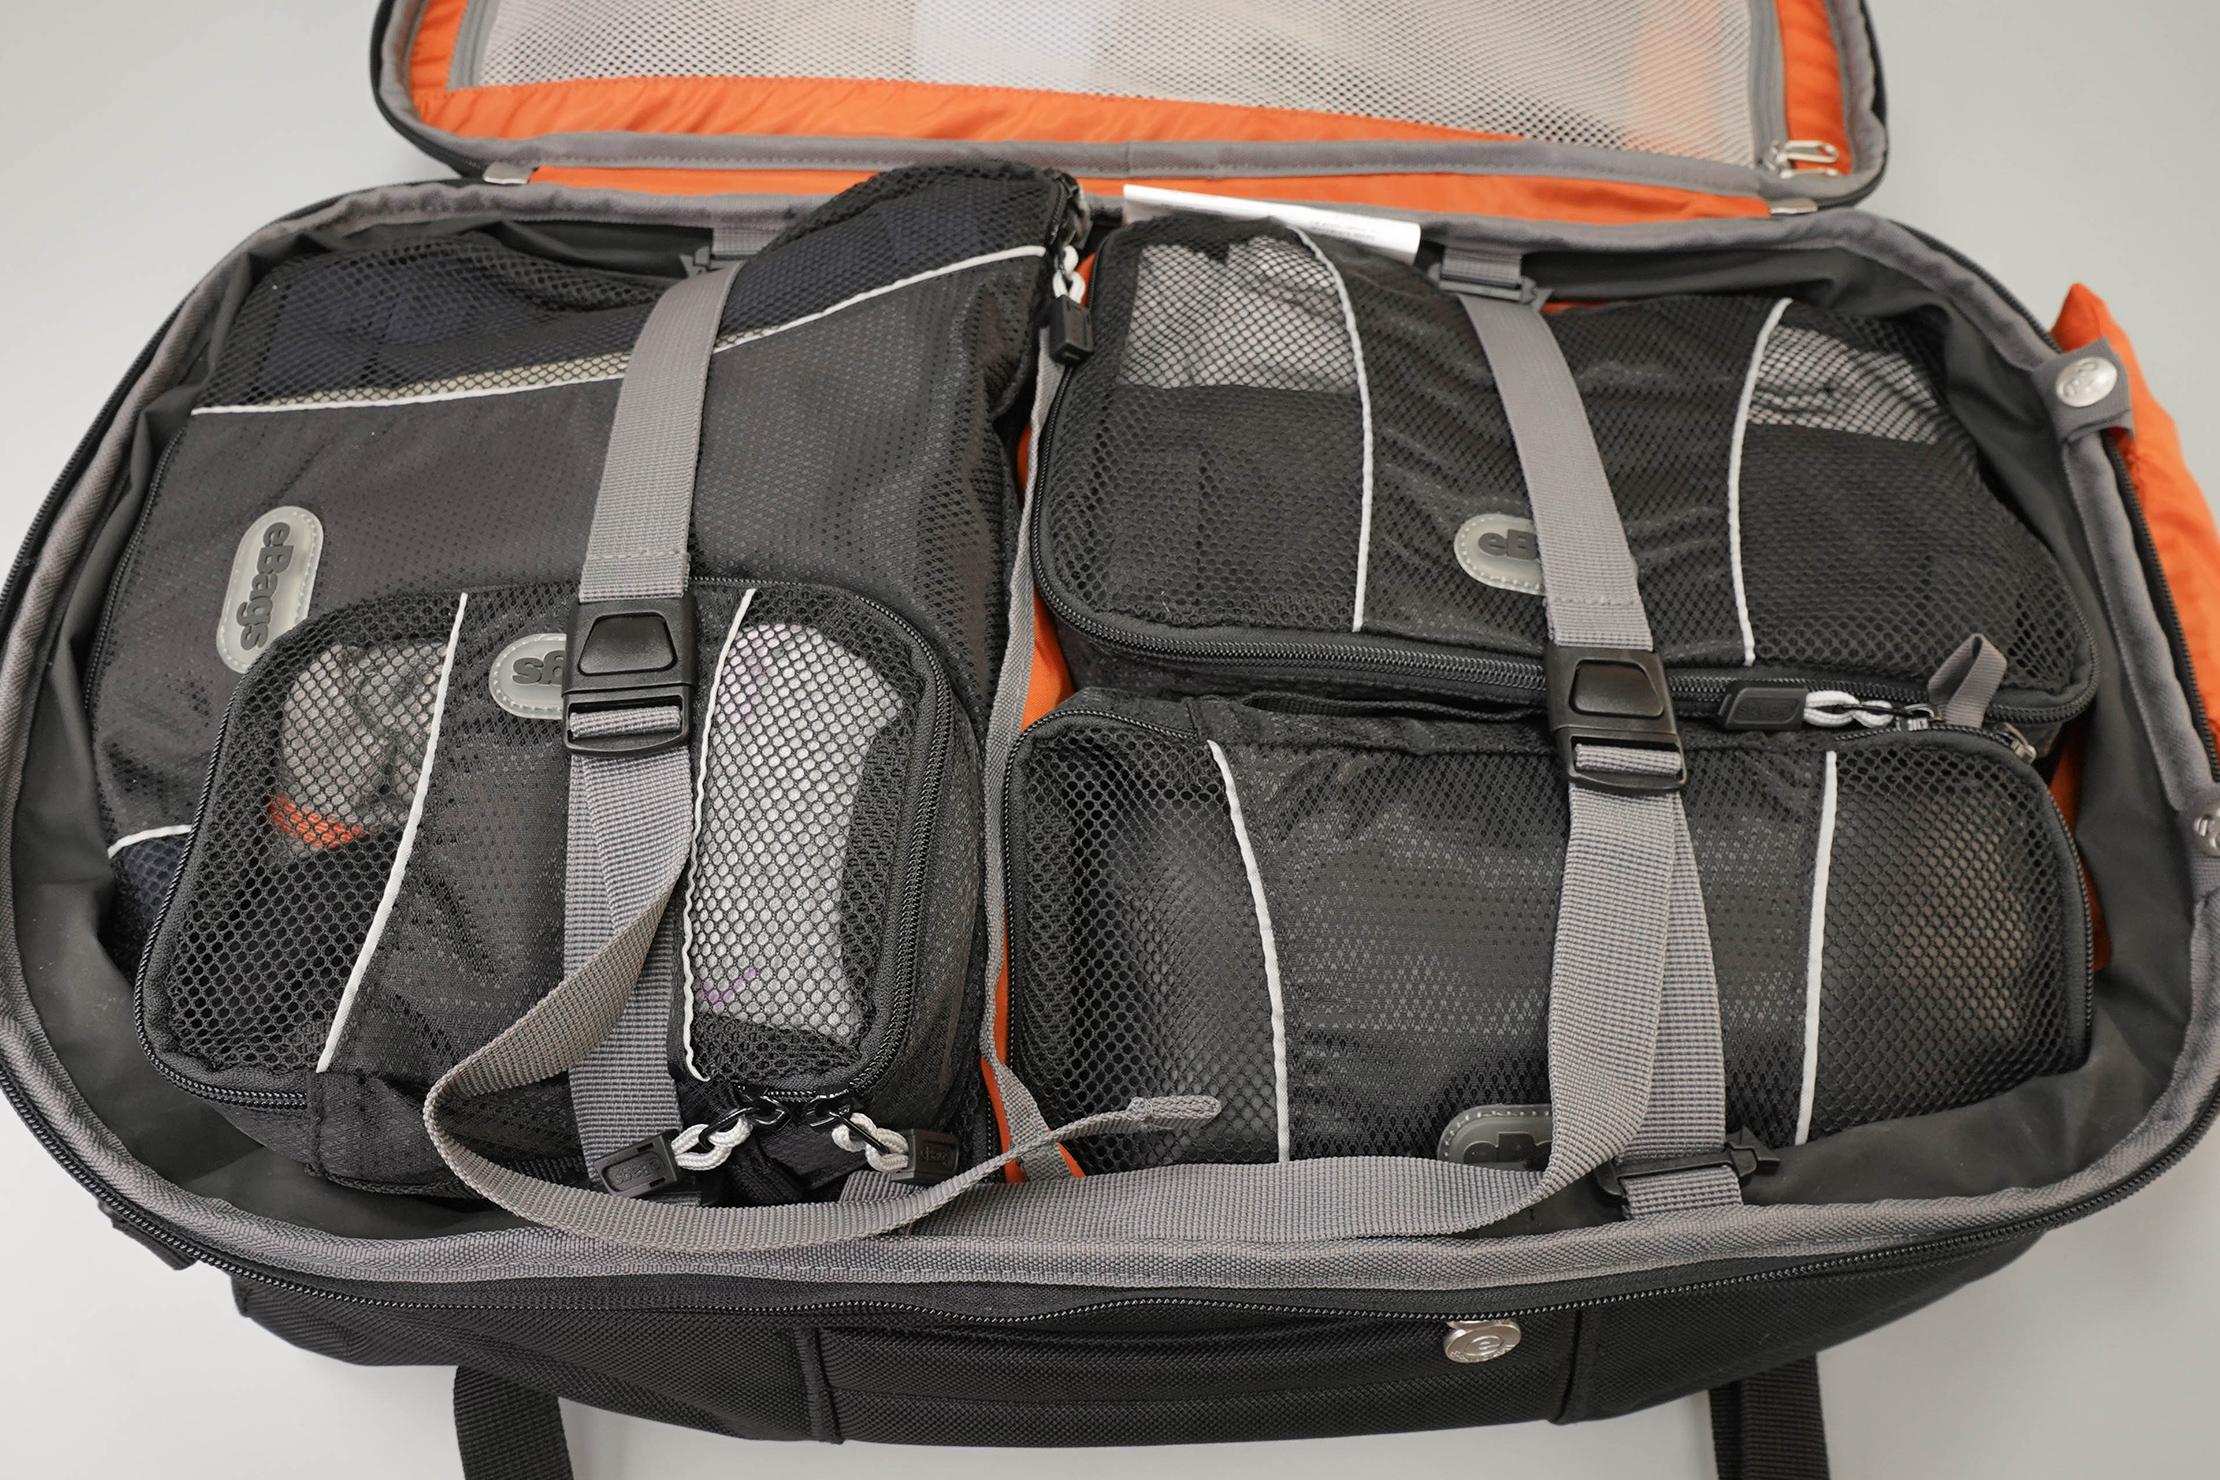 eBags TLS Mother Lode Weekender Convertible Packing Cubes